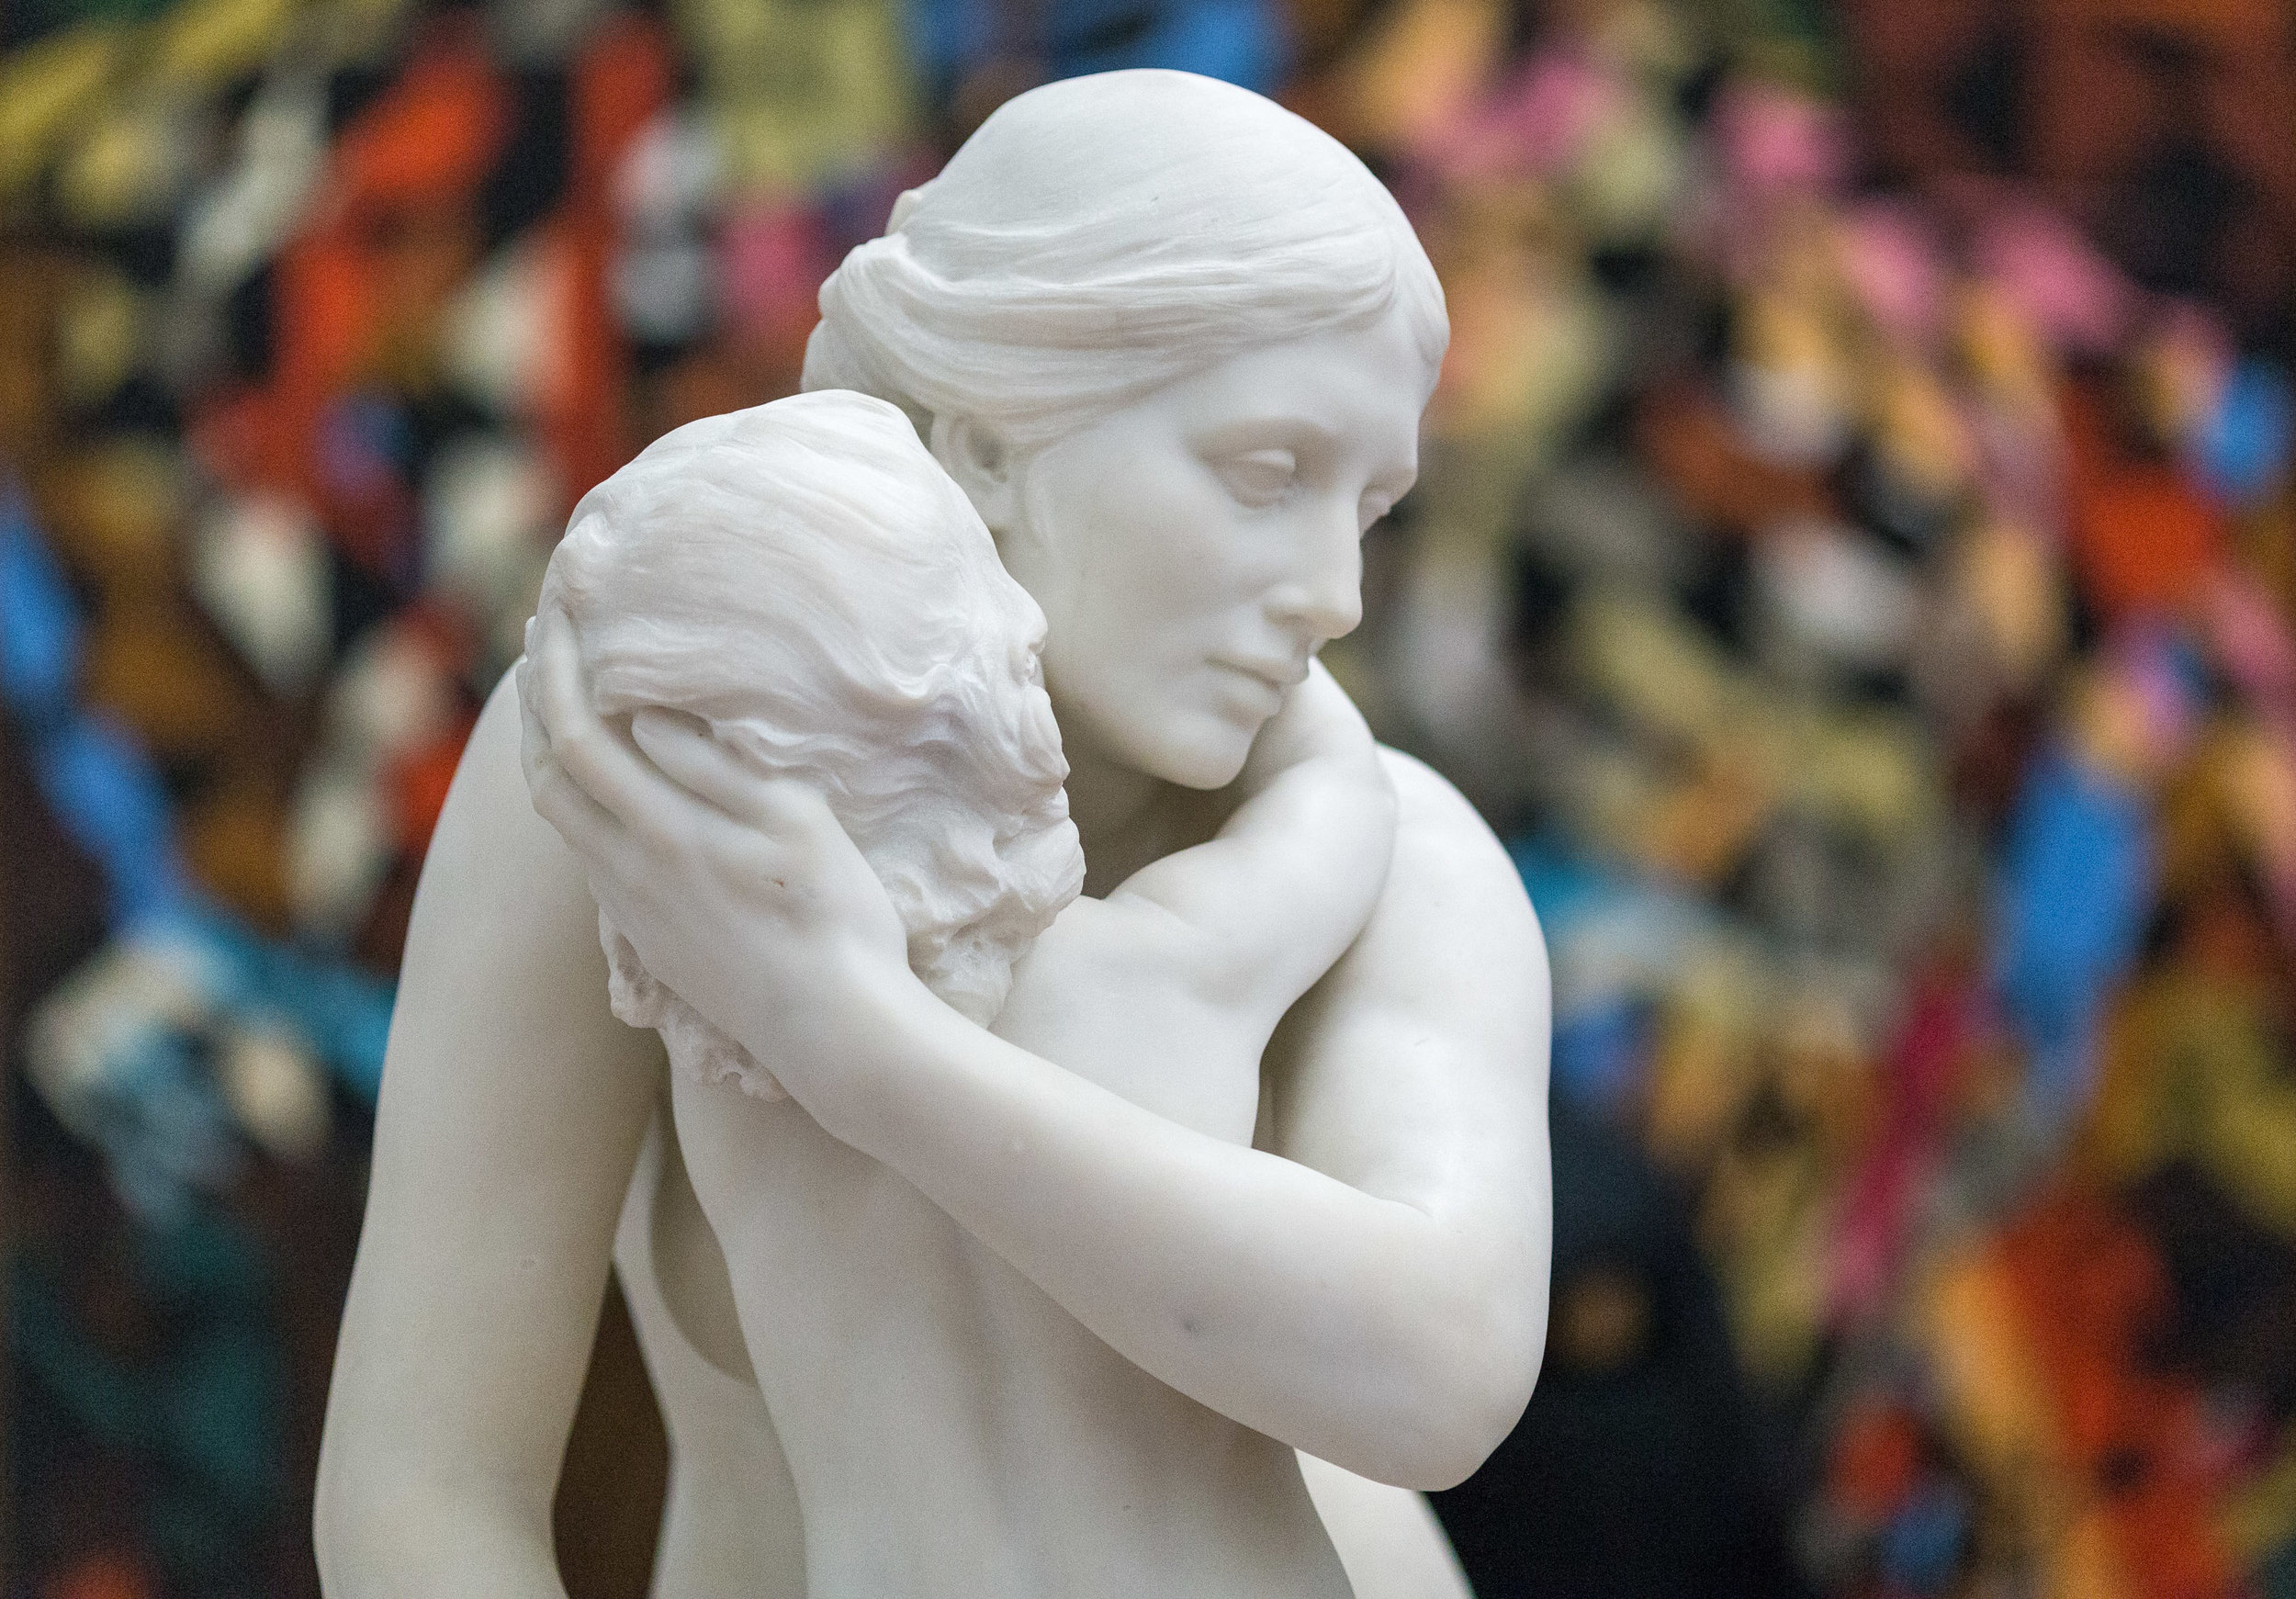 The Kiss by Hamo Thornycroft